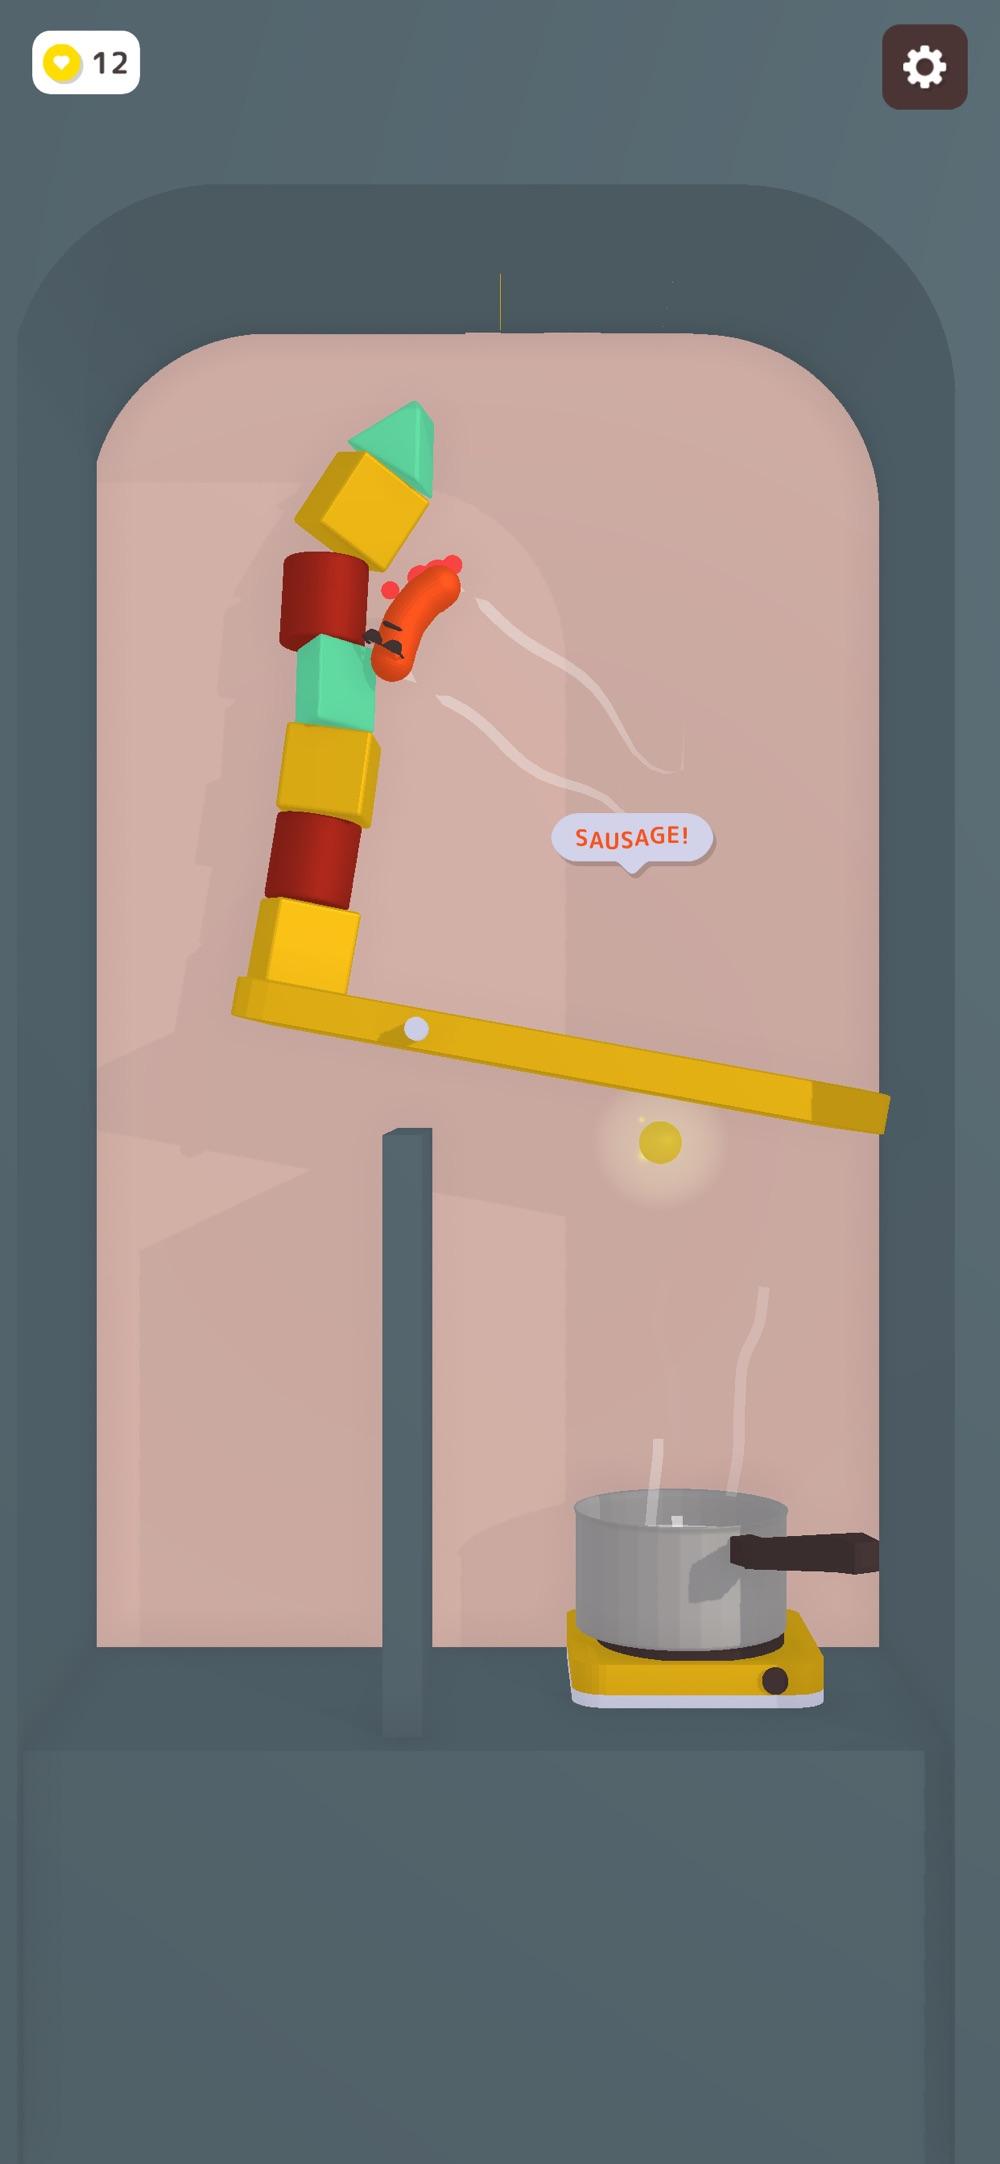 Sausage Swing Club hack tool